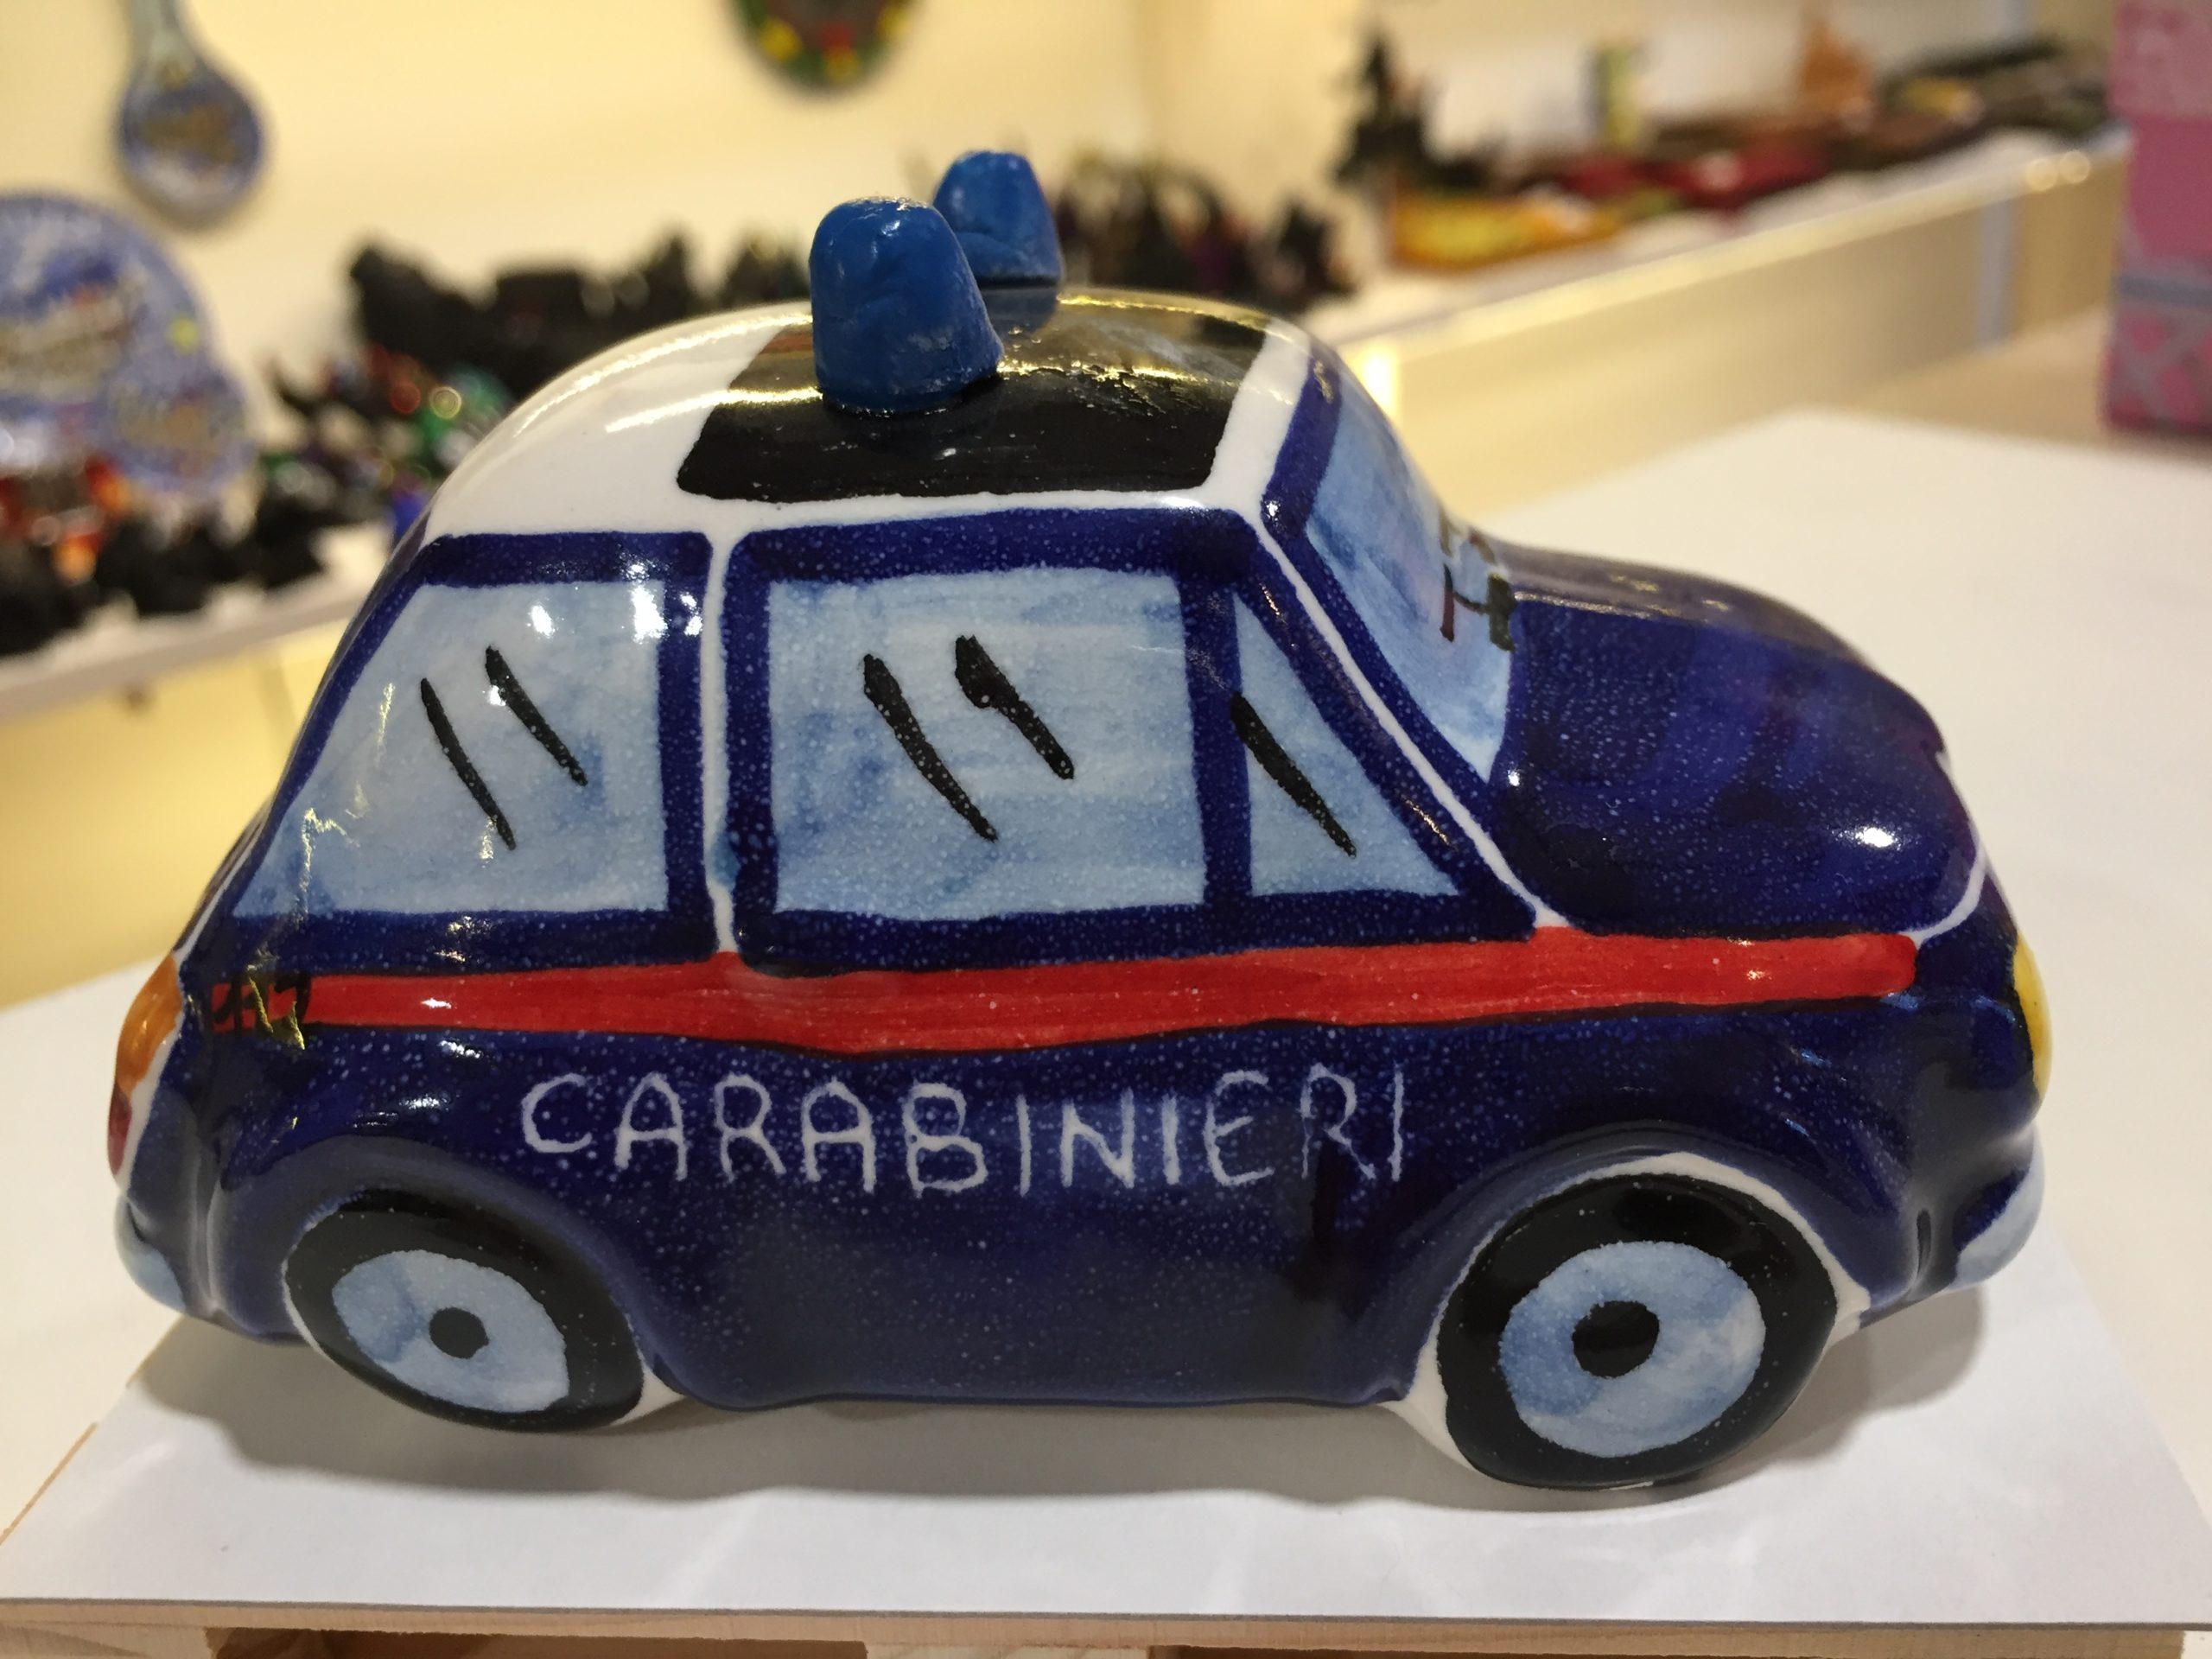 500 Carabinieri in Ceramica di Caltagirone